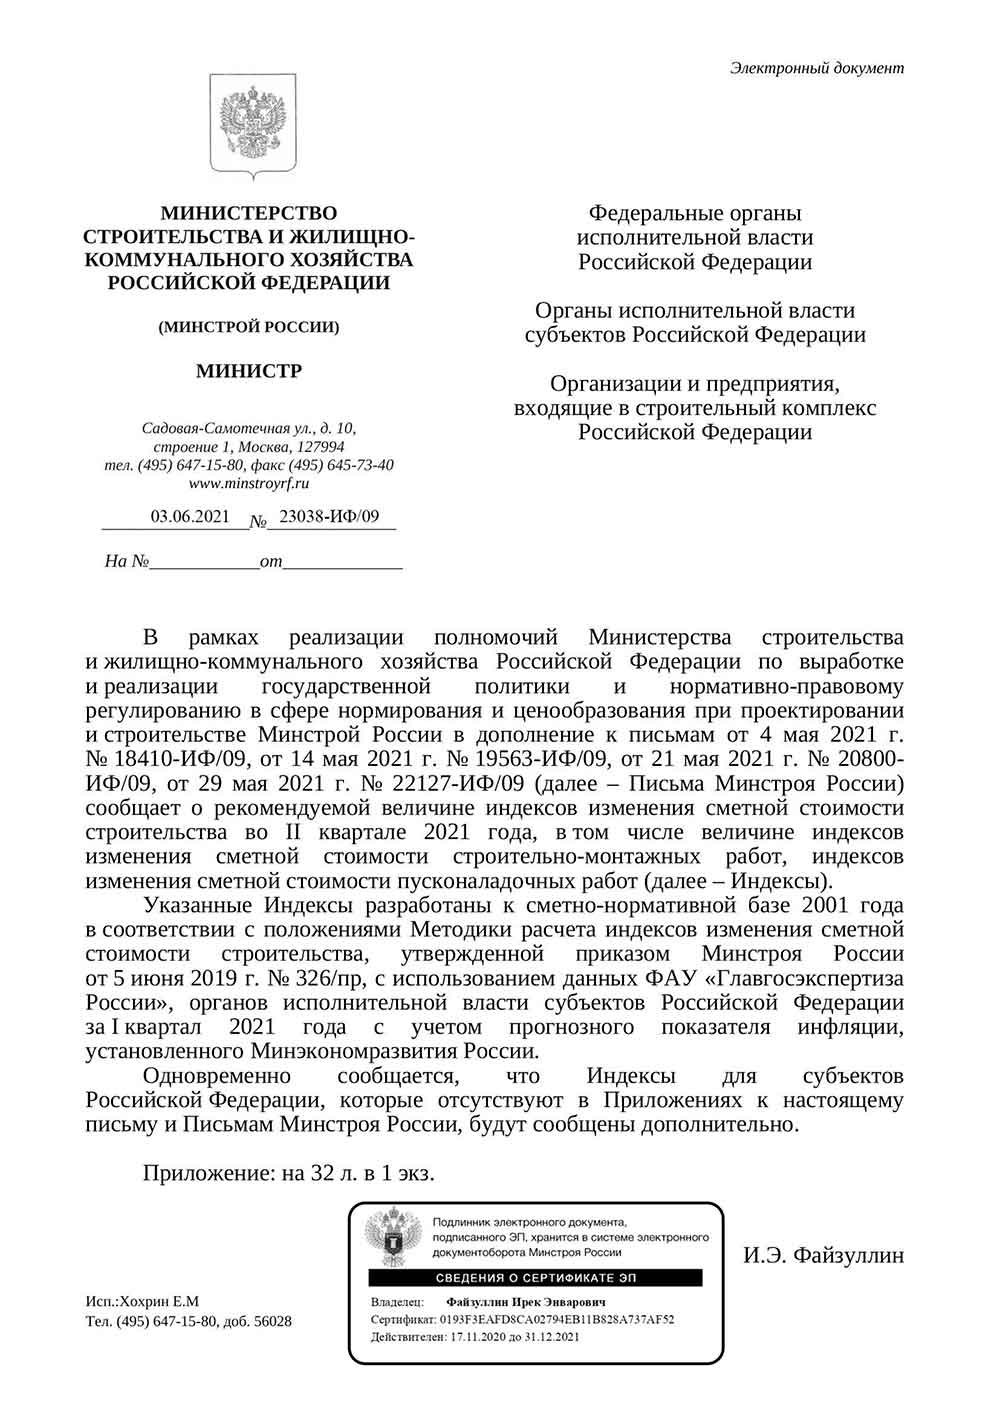 Письмо Минстроя РФ №23038-ИФ/09 от 03.06.2021 г.